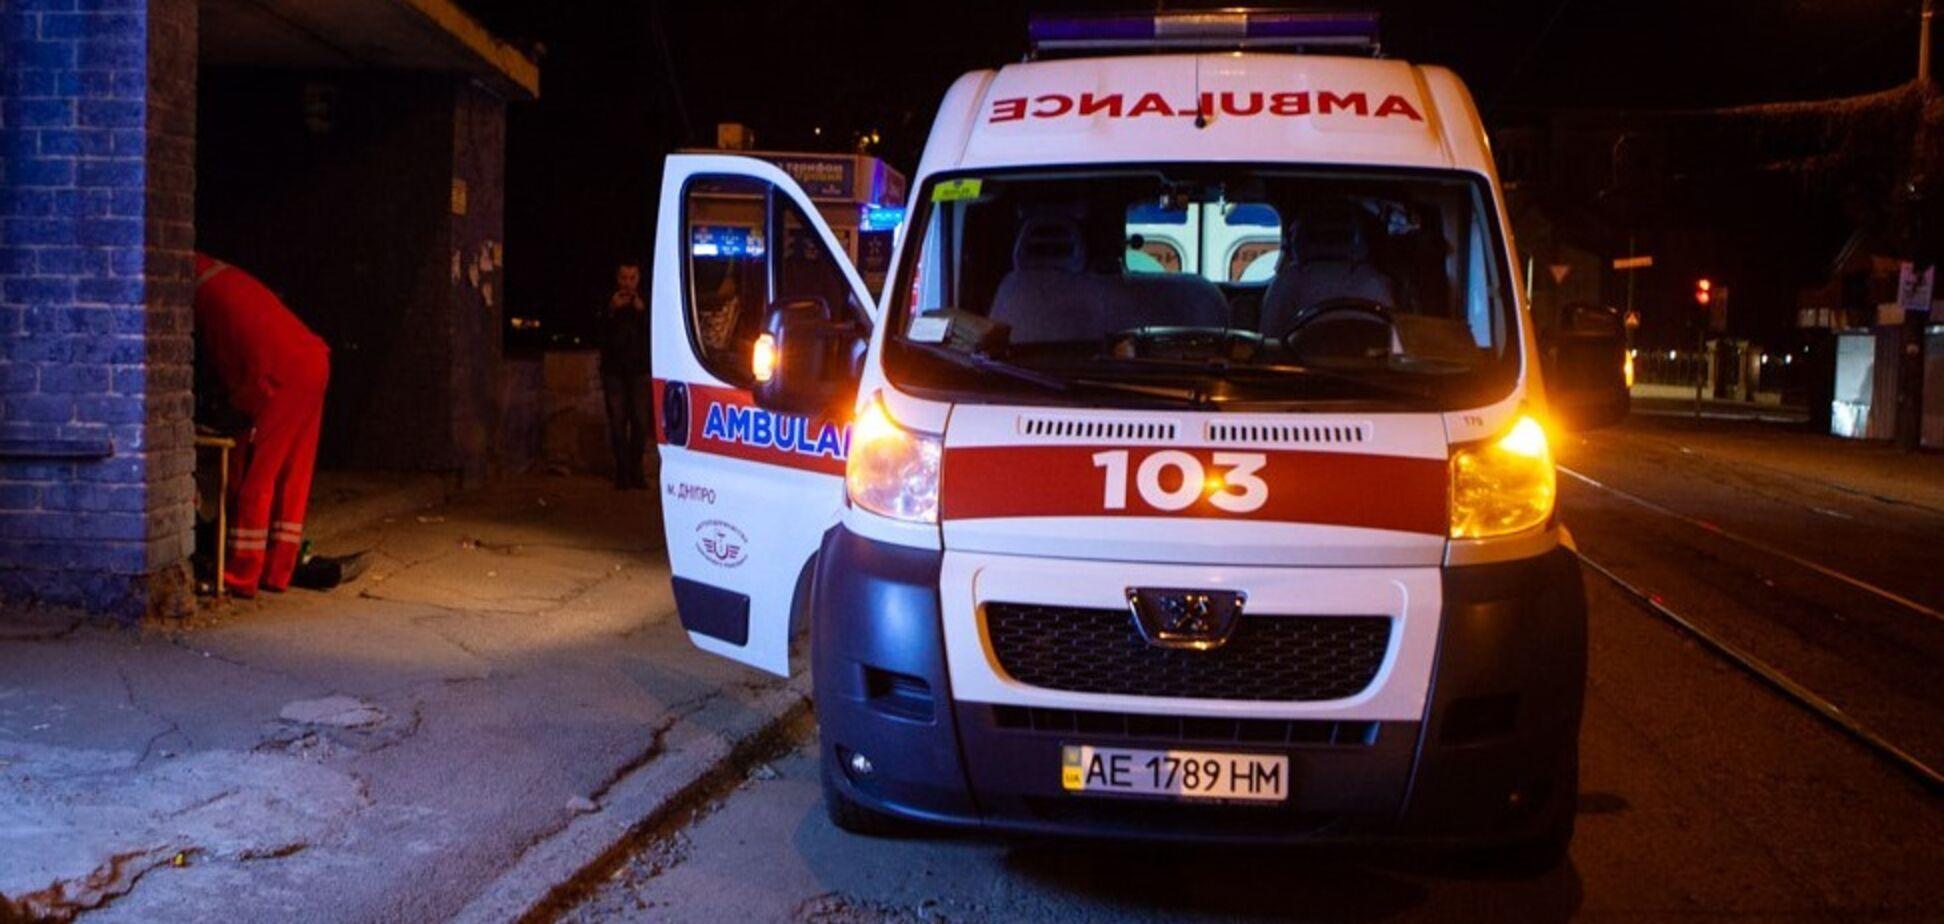 В Днепре на трамвайной остановке умер мужчина. Видео